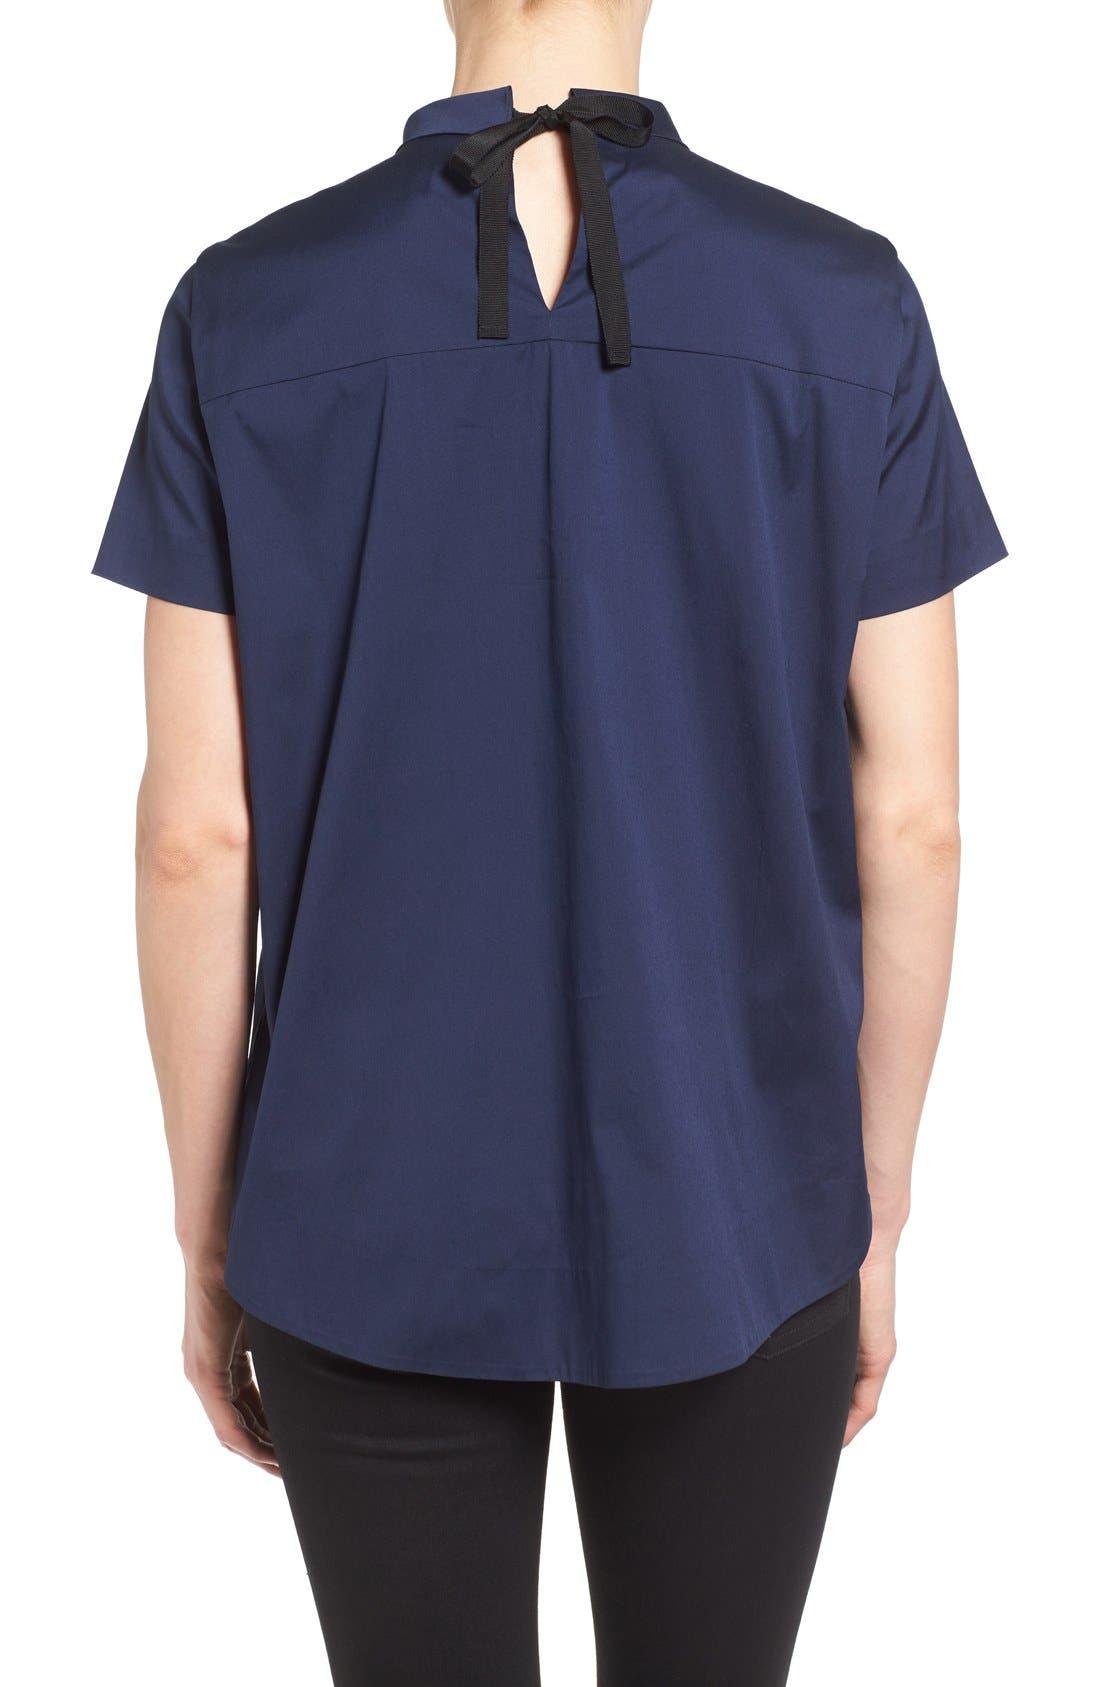 Alternate Image 1 Selected - Halogen® Tie Back Short Sleeve Poplin Blouse (Regular & Petite)